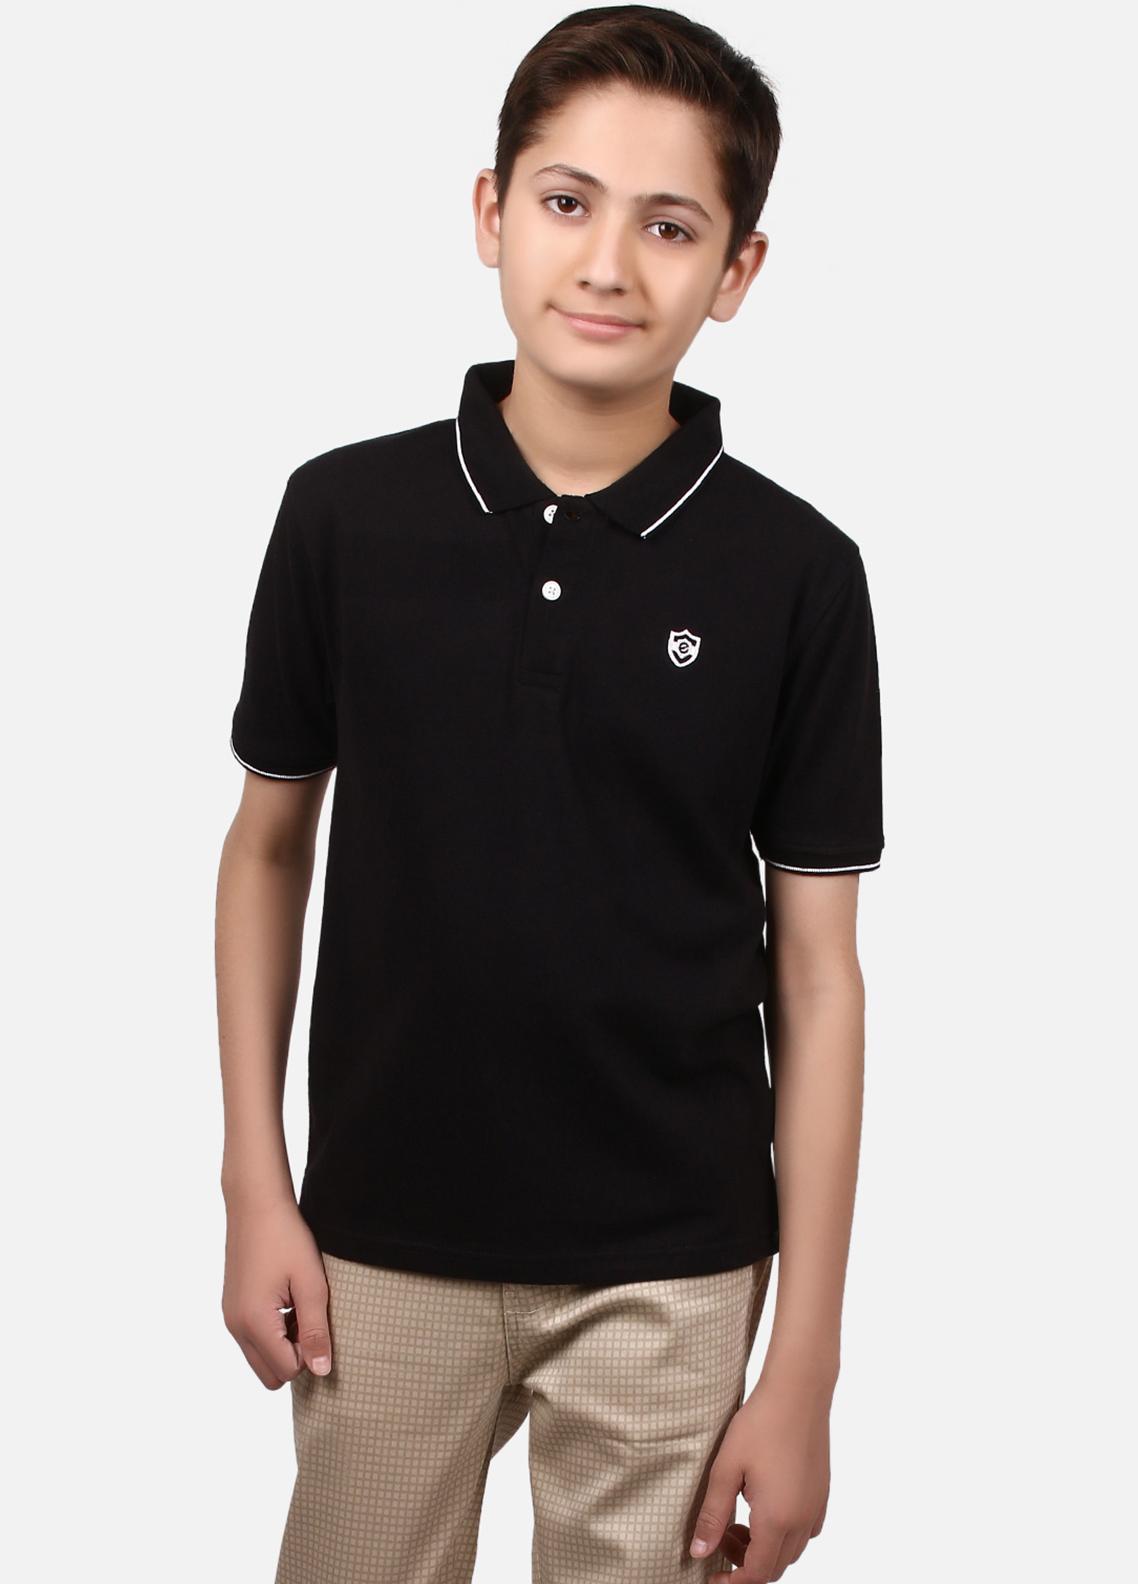 Edenrobe Cotton Polo Shirts for Boys - Black EBTPS19-008